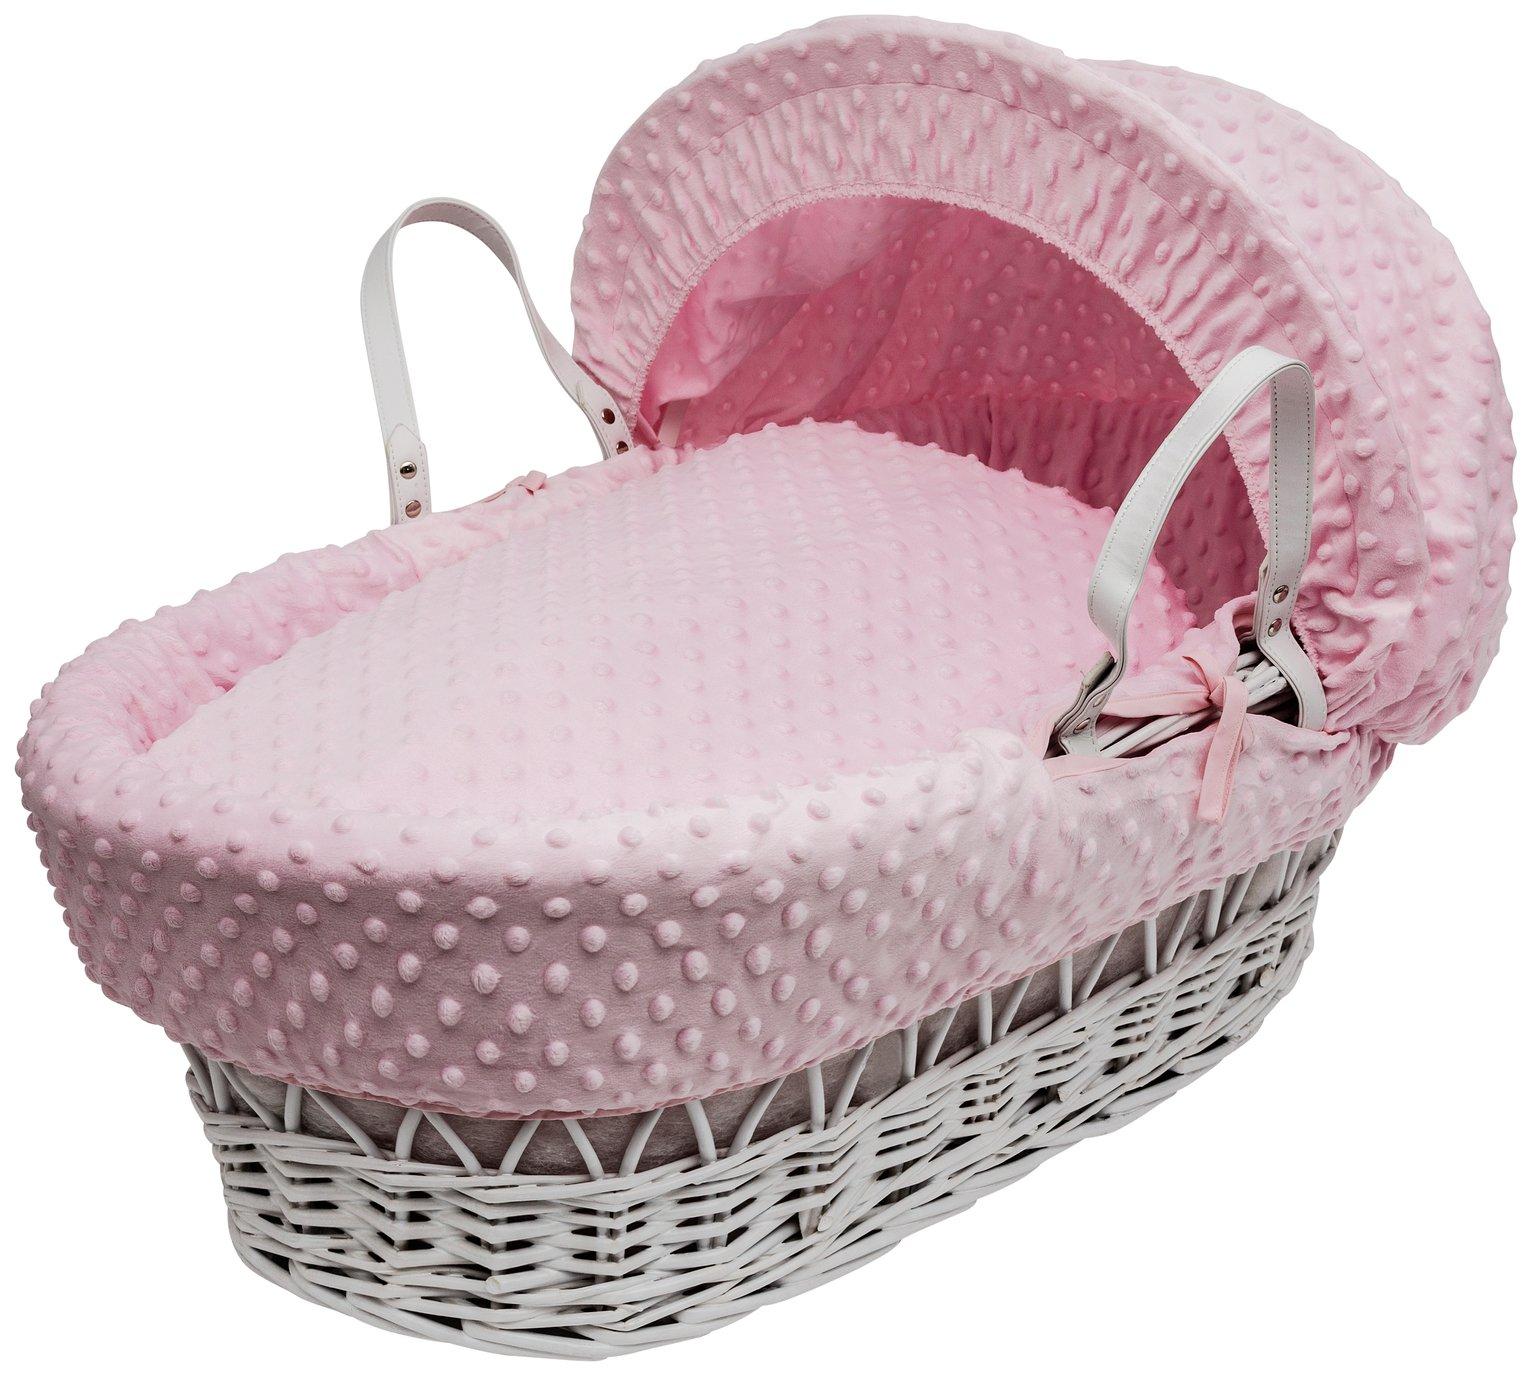 Kinder Valley Pink Dimple White Wicker Basket